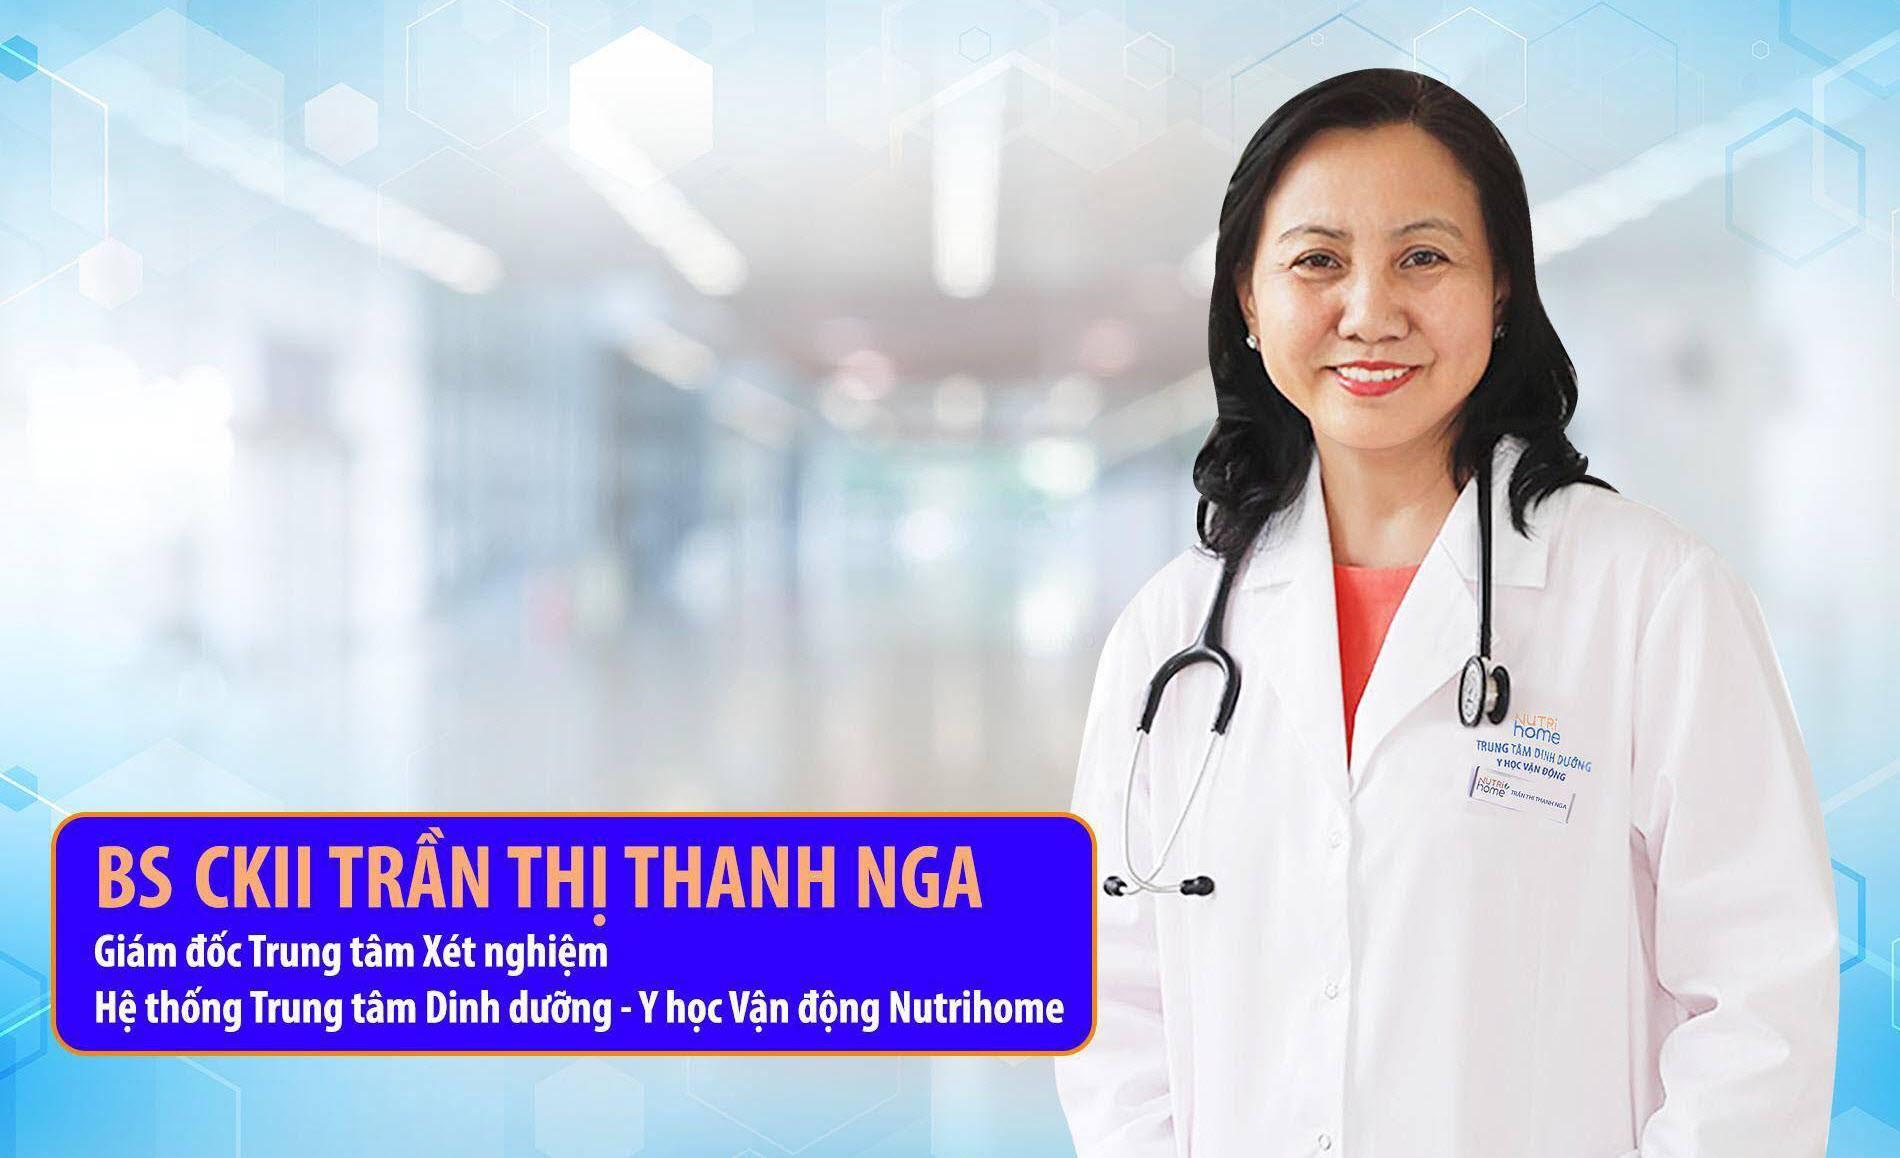 BS CKII Trần Thị Thanh Nga